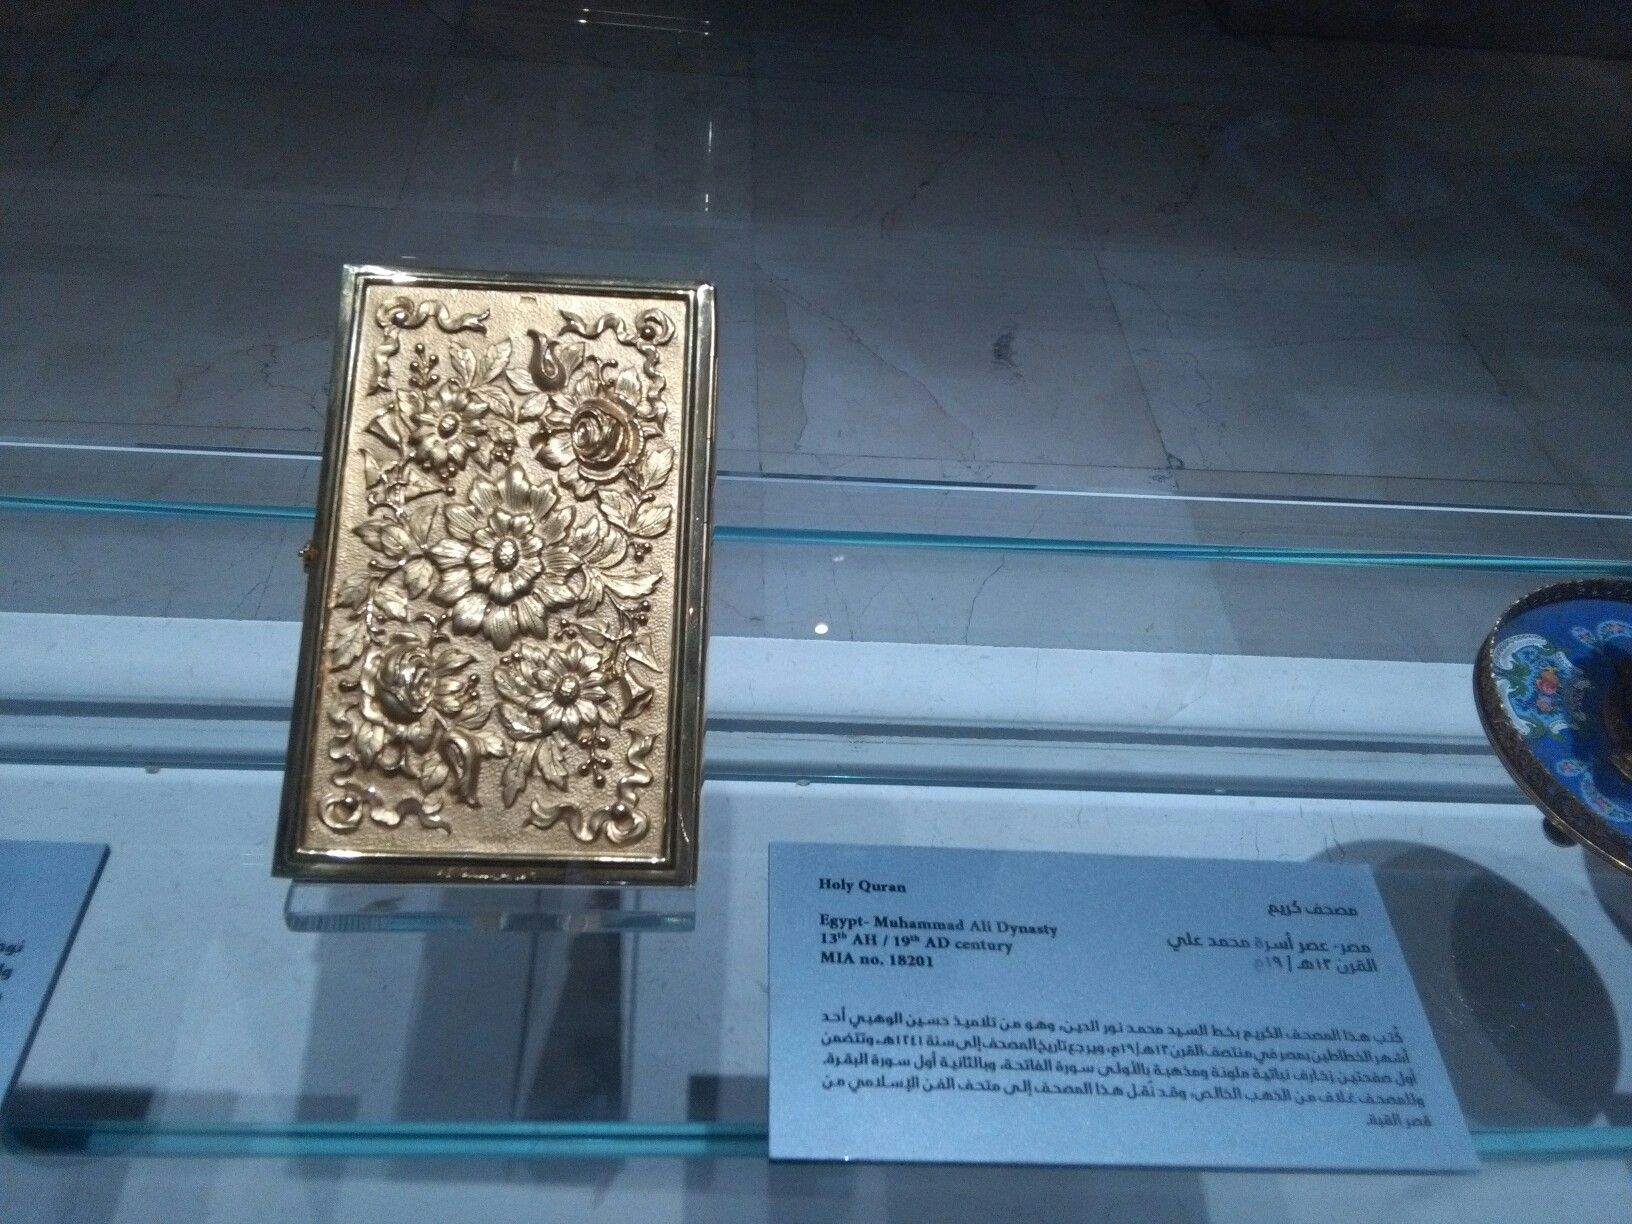 Pin By Nagwa Samir On Islamic Museum And Islamic Art Islamic Art Money Clip